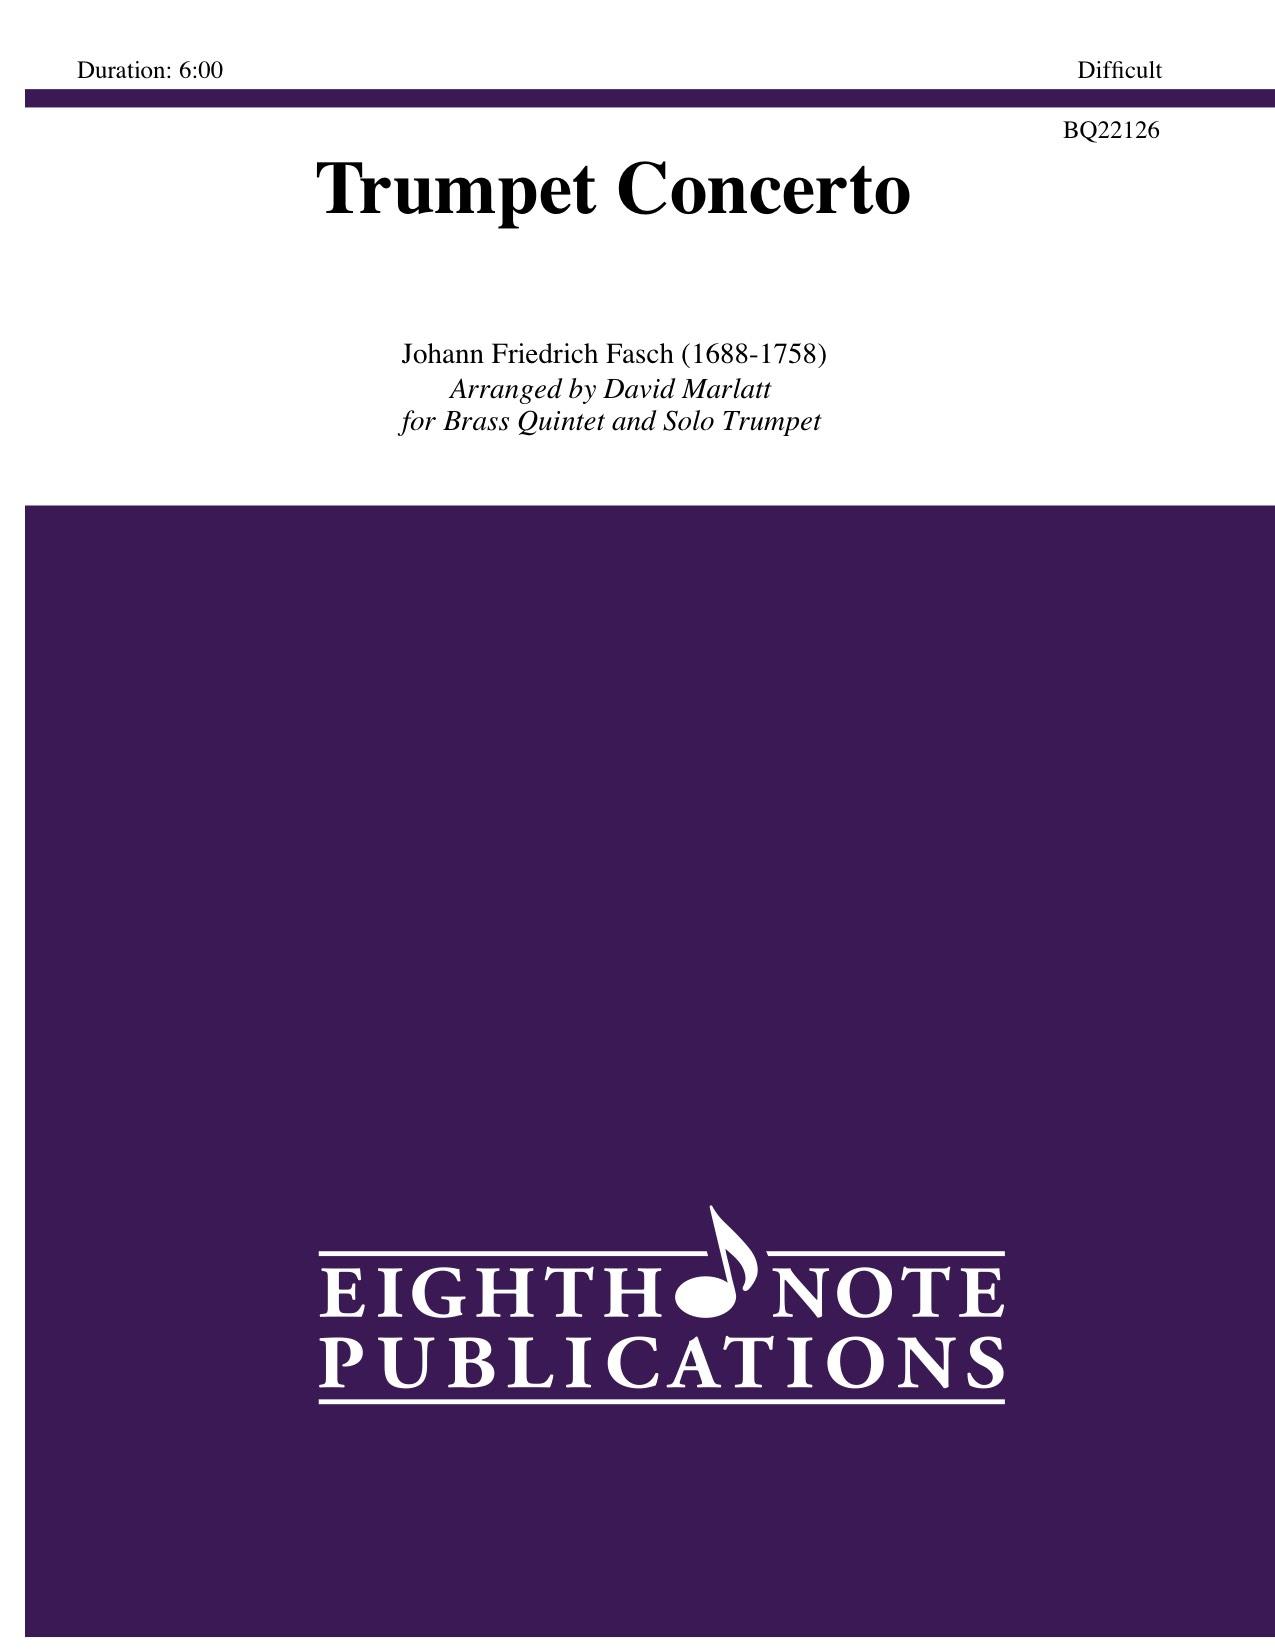 Trumpet Concerto - Johann Friedrich Fasch